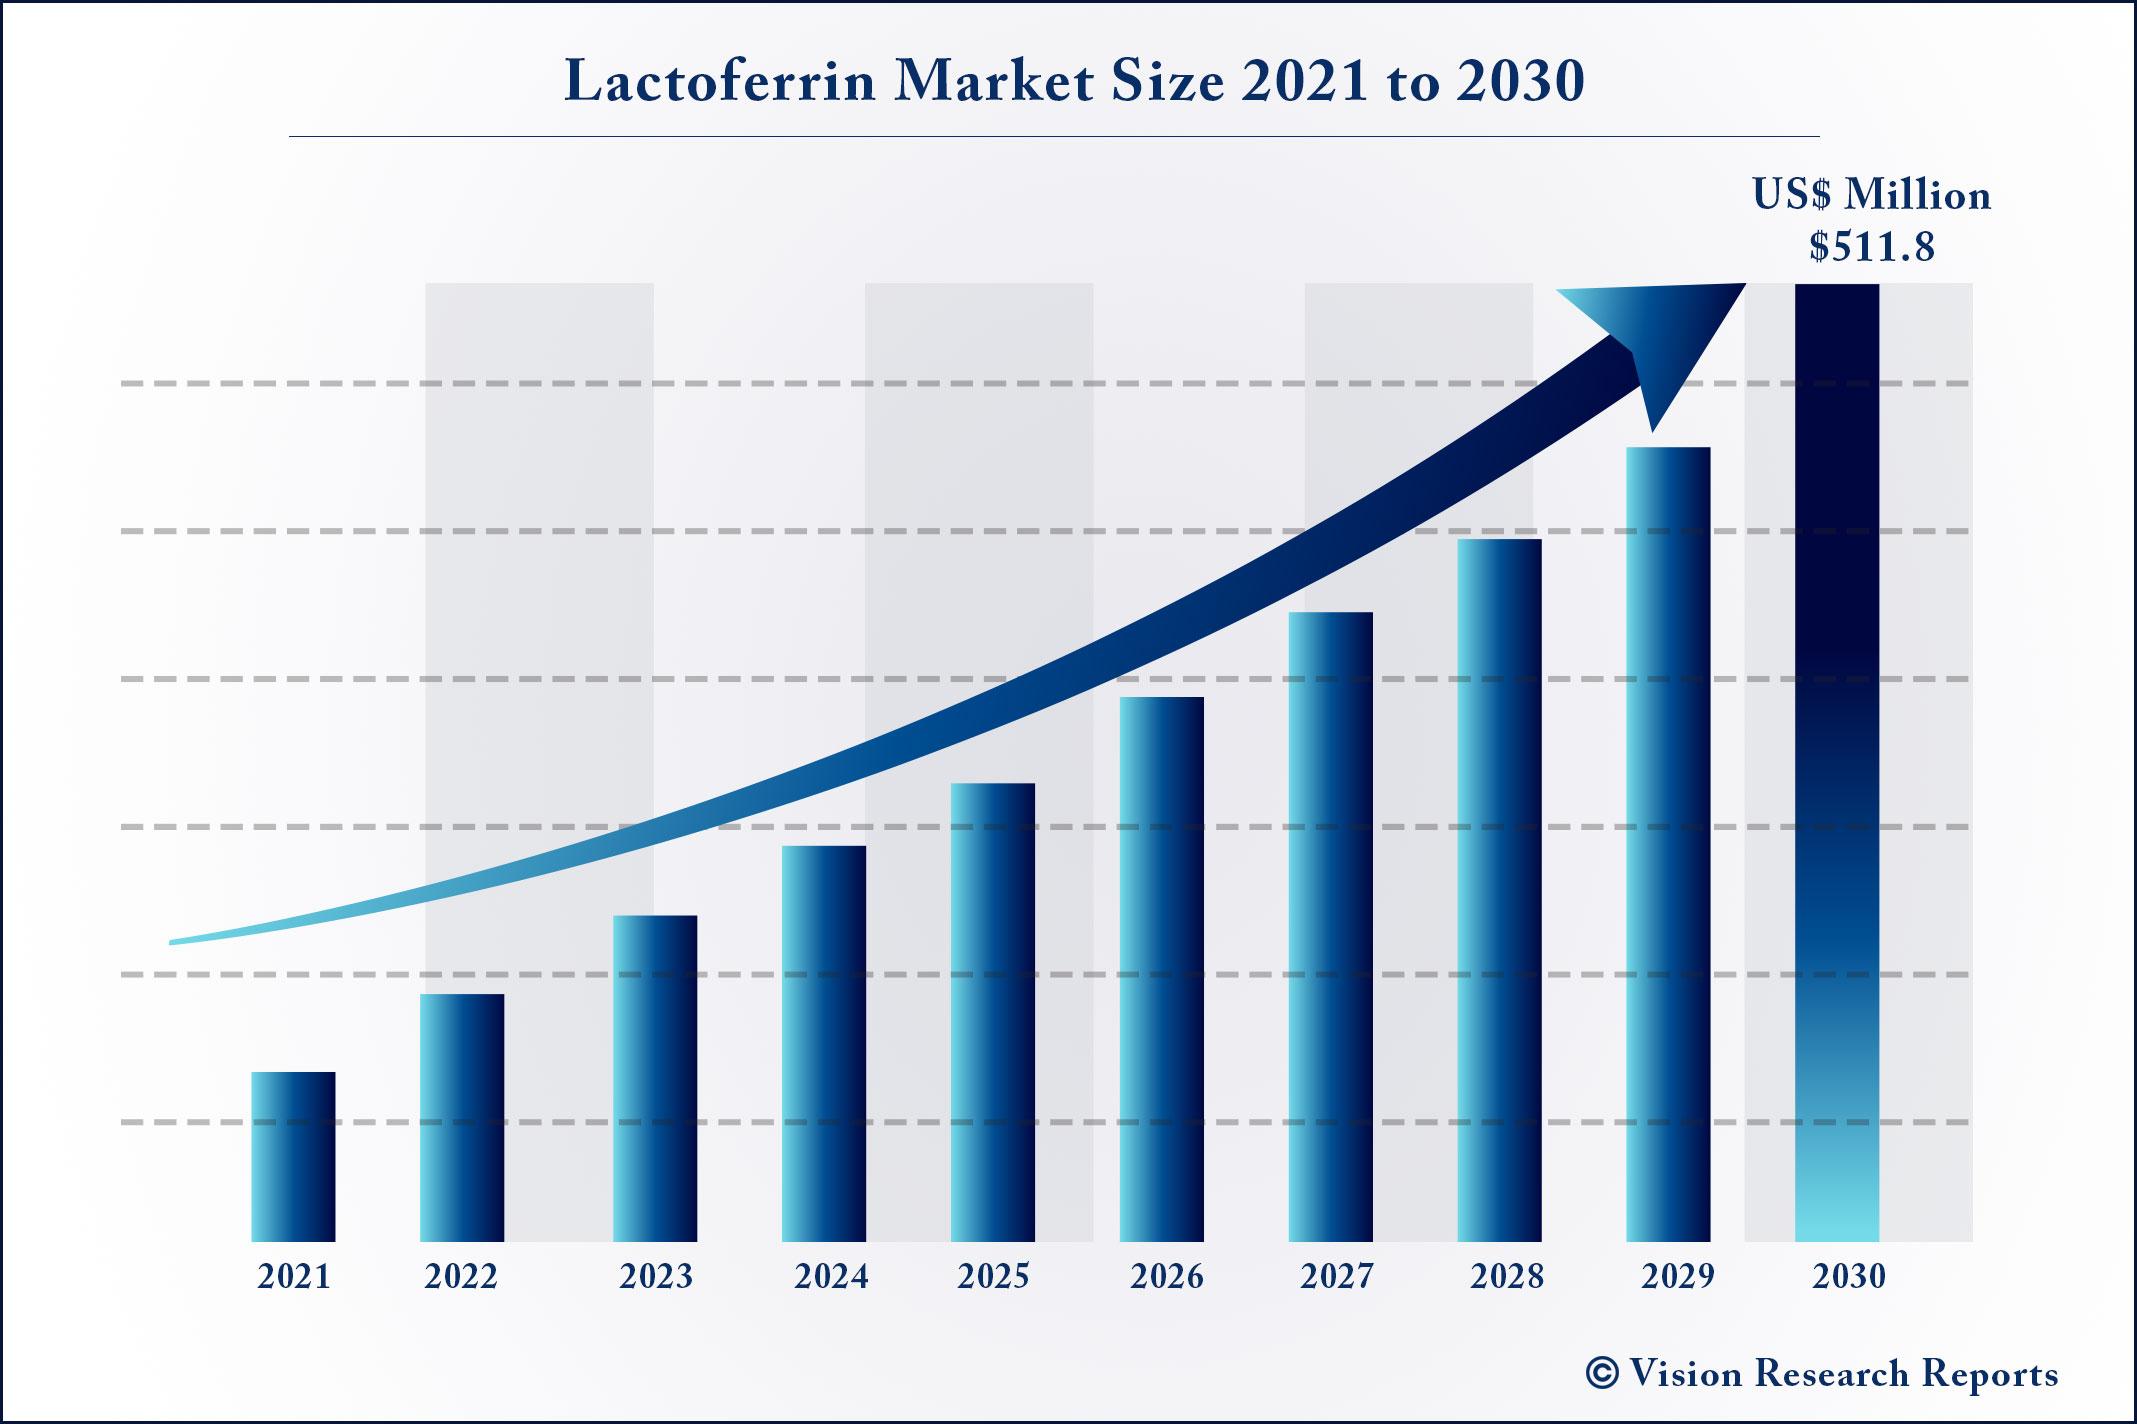 Lactoferrin Market Size 2021 to 2030